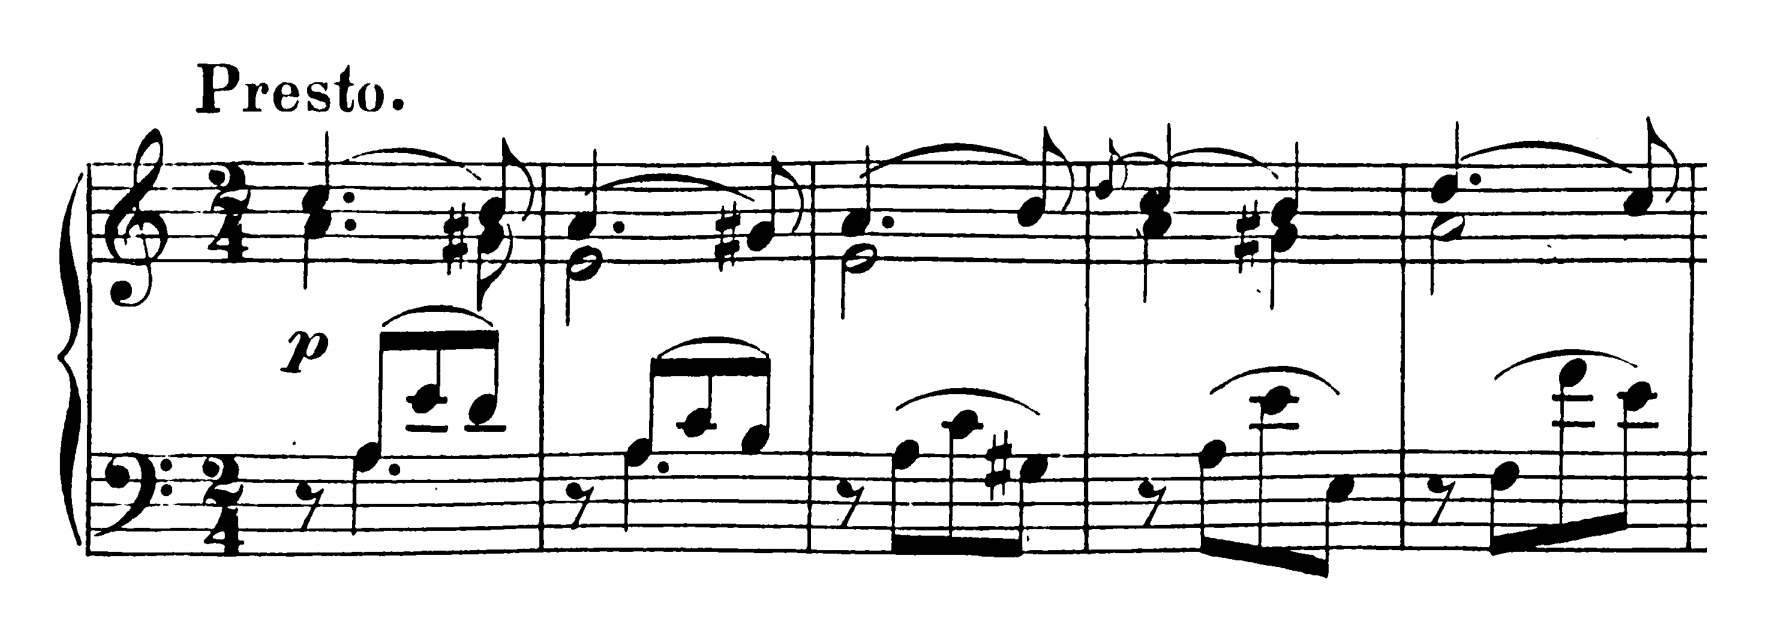 Mozart: Piano Sonata No 8 in A minor, K 310 Analysis